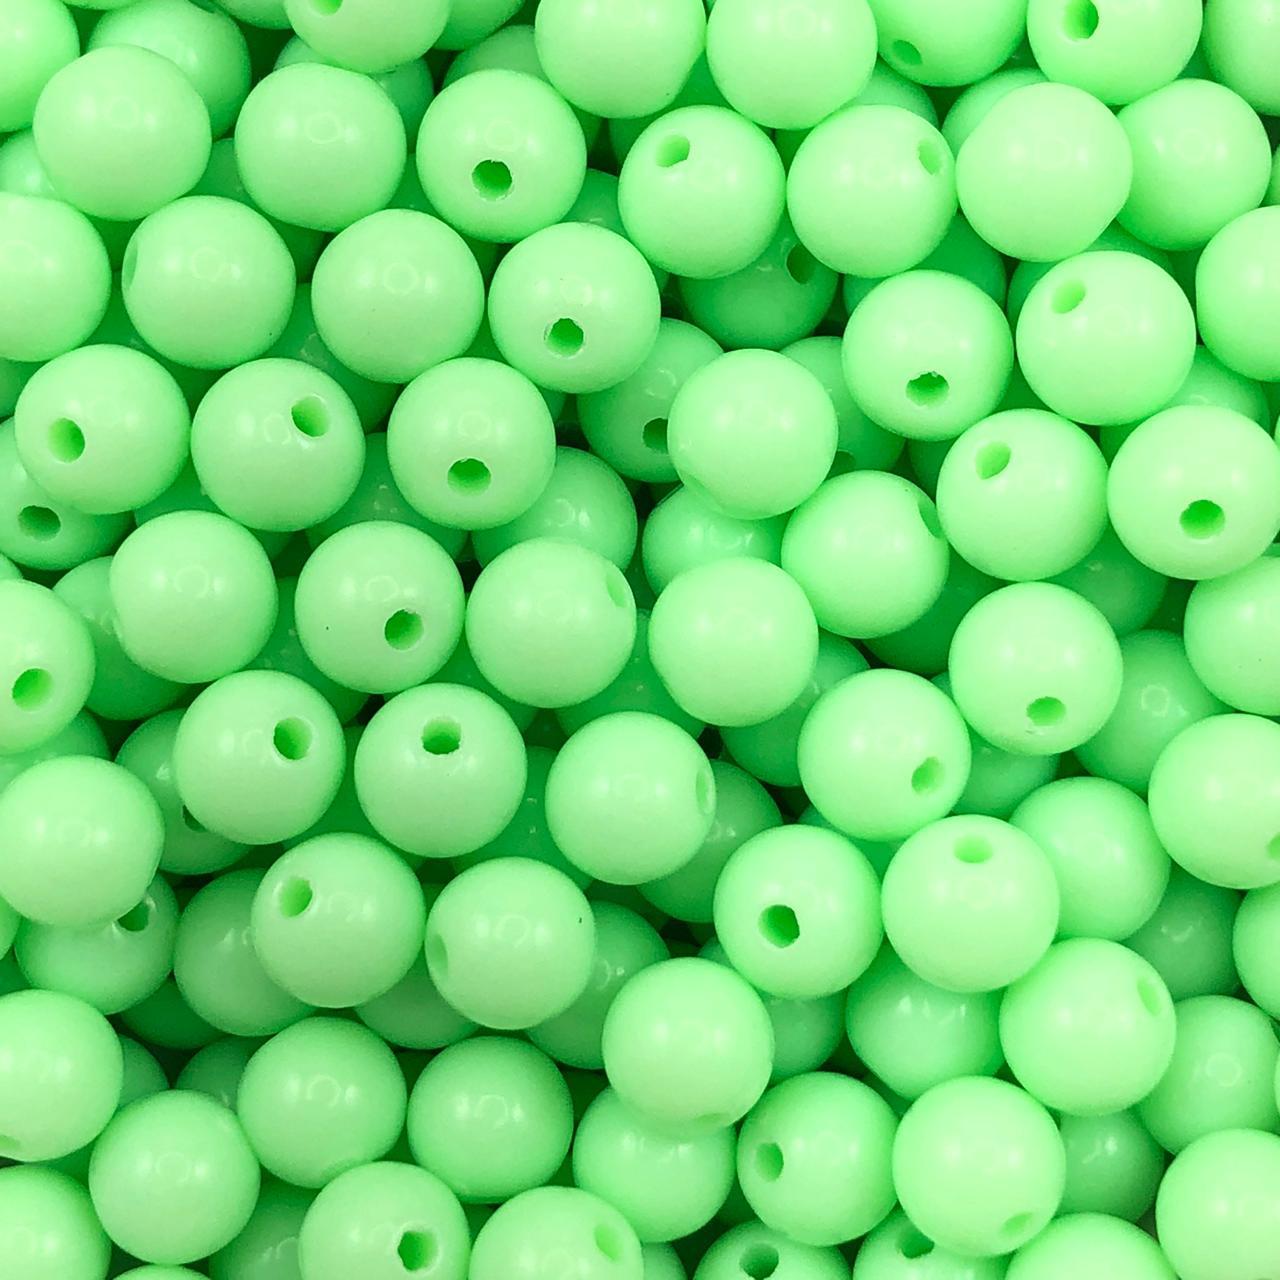 BOL654 - Bola Plástica Verde Menta 8mm - 20Grs